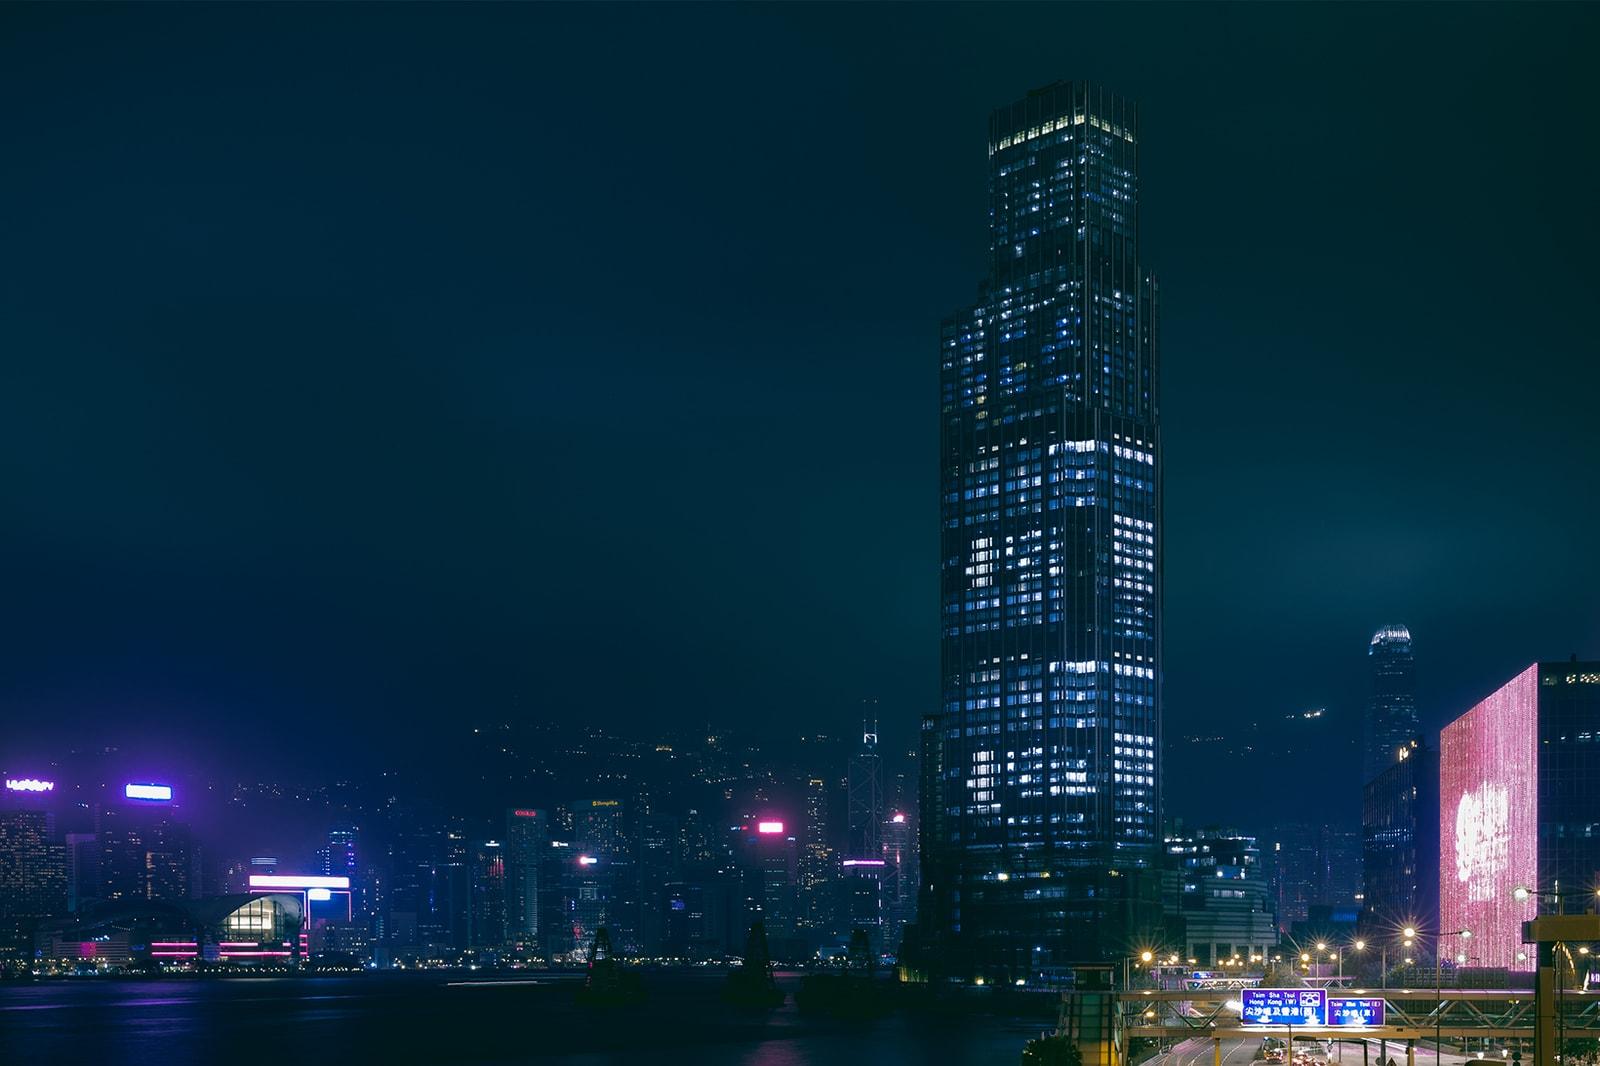 K11 Foundation Hong Kong Victoria Dockside Development Adrian Cheng Cultural Hub Workspace